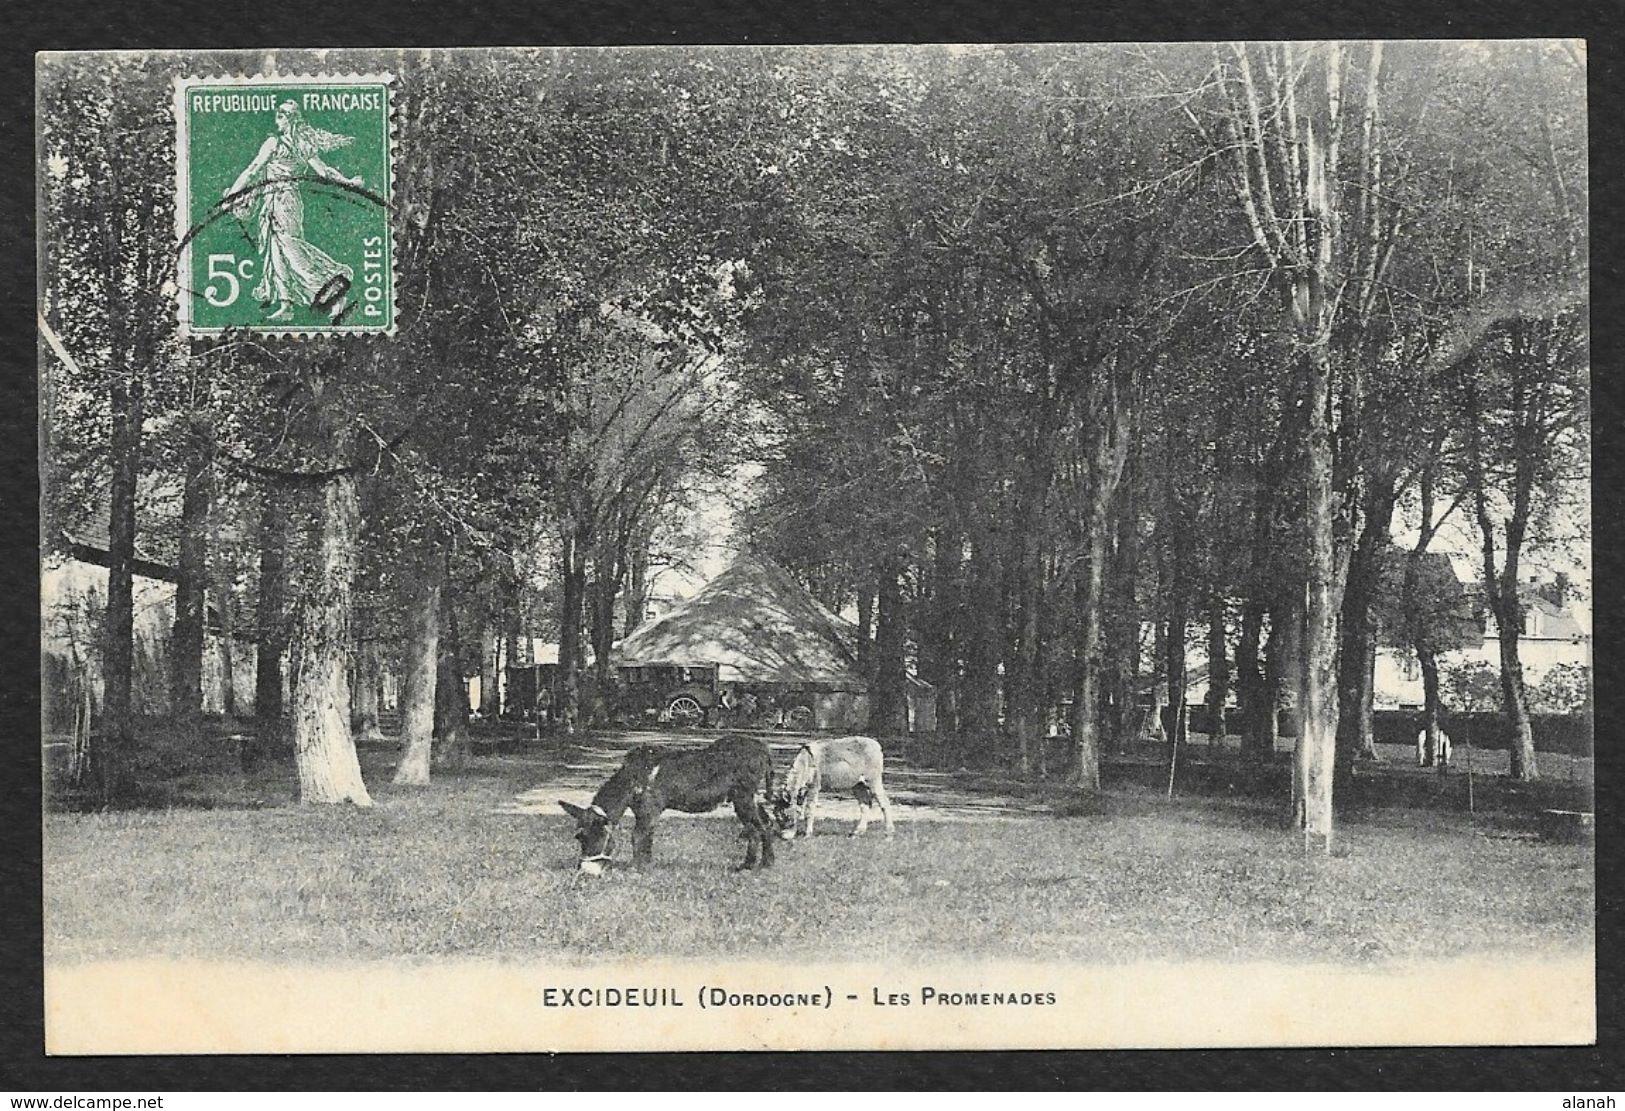 EXCIDEUIL Rare Les Promenades Anes () Dordogne (24) - Francia